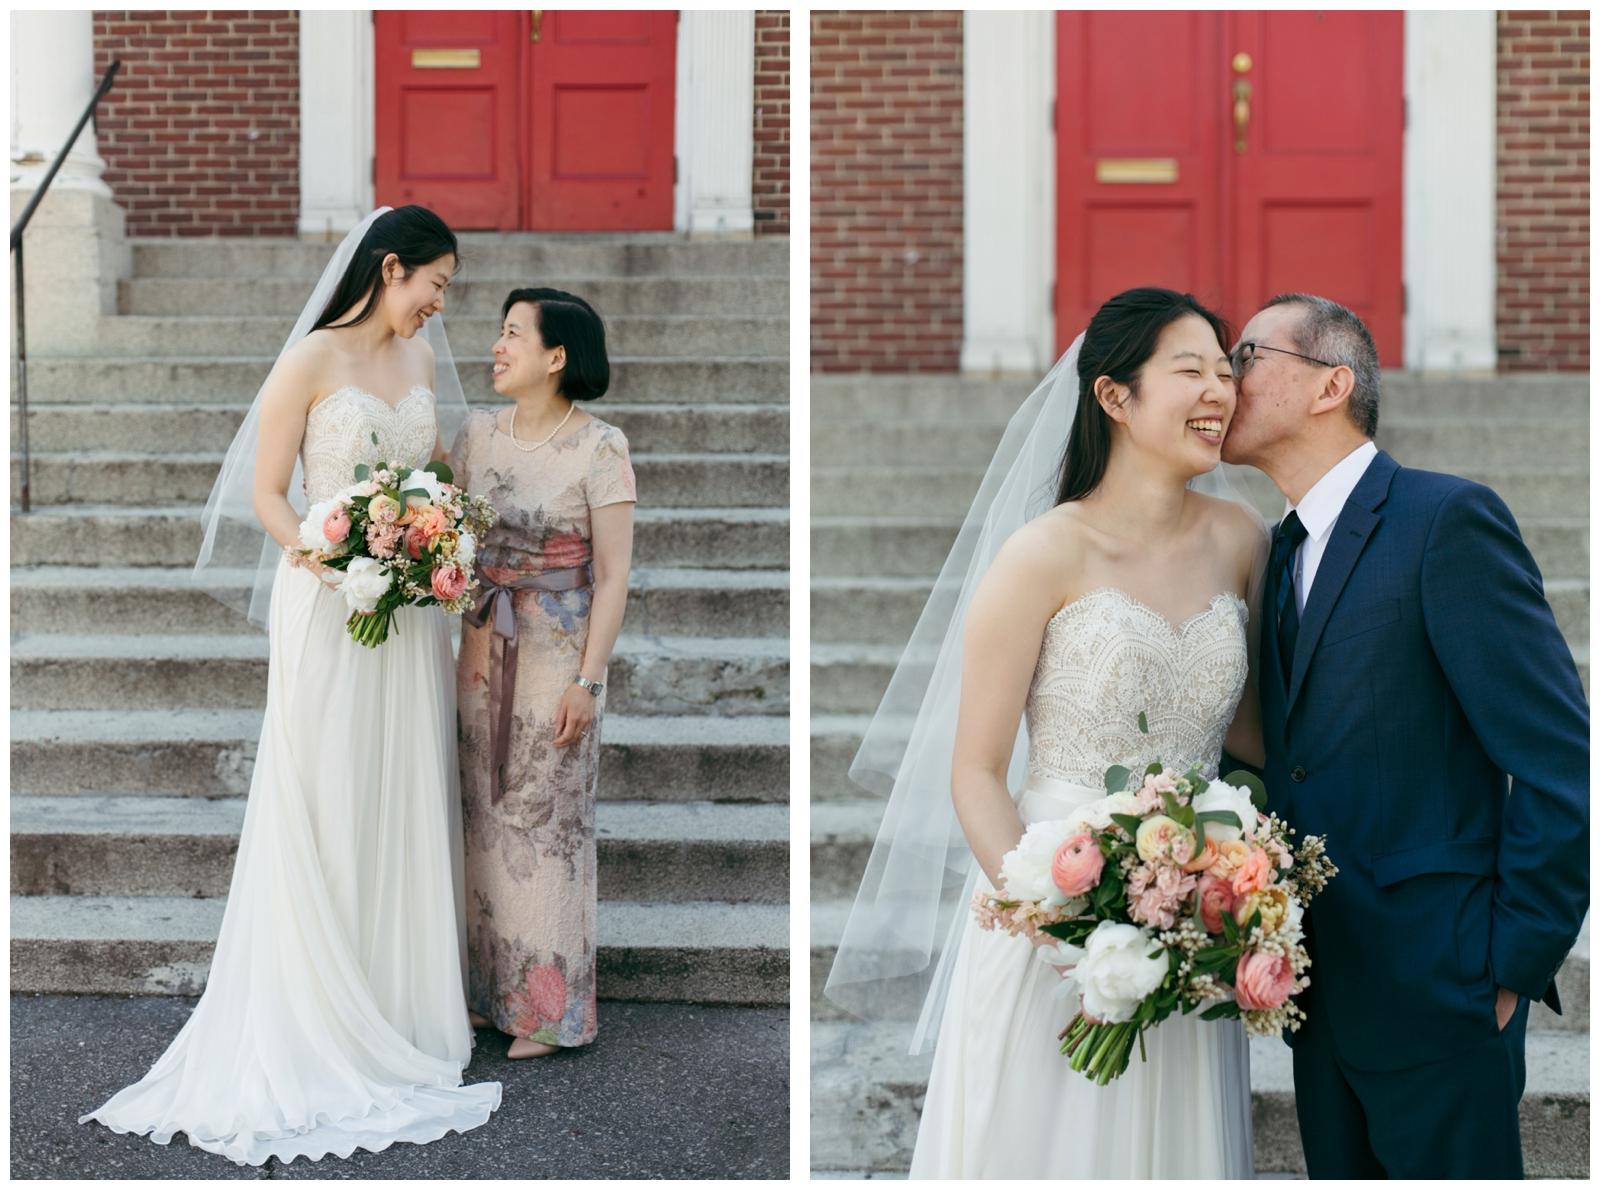 Samberg-Conference-Center-Boston-Wedding-Photographer-Bailey-Q-Photo-073.jpg